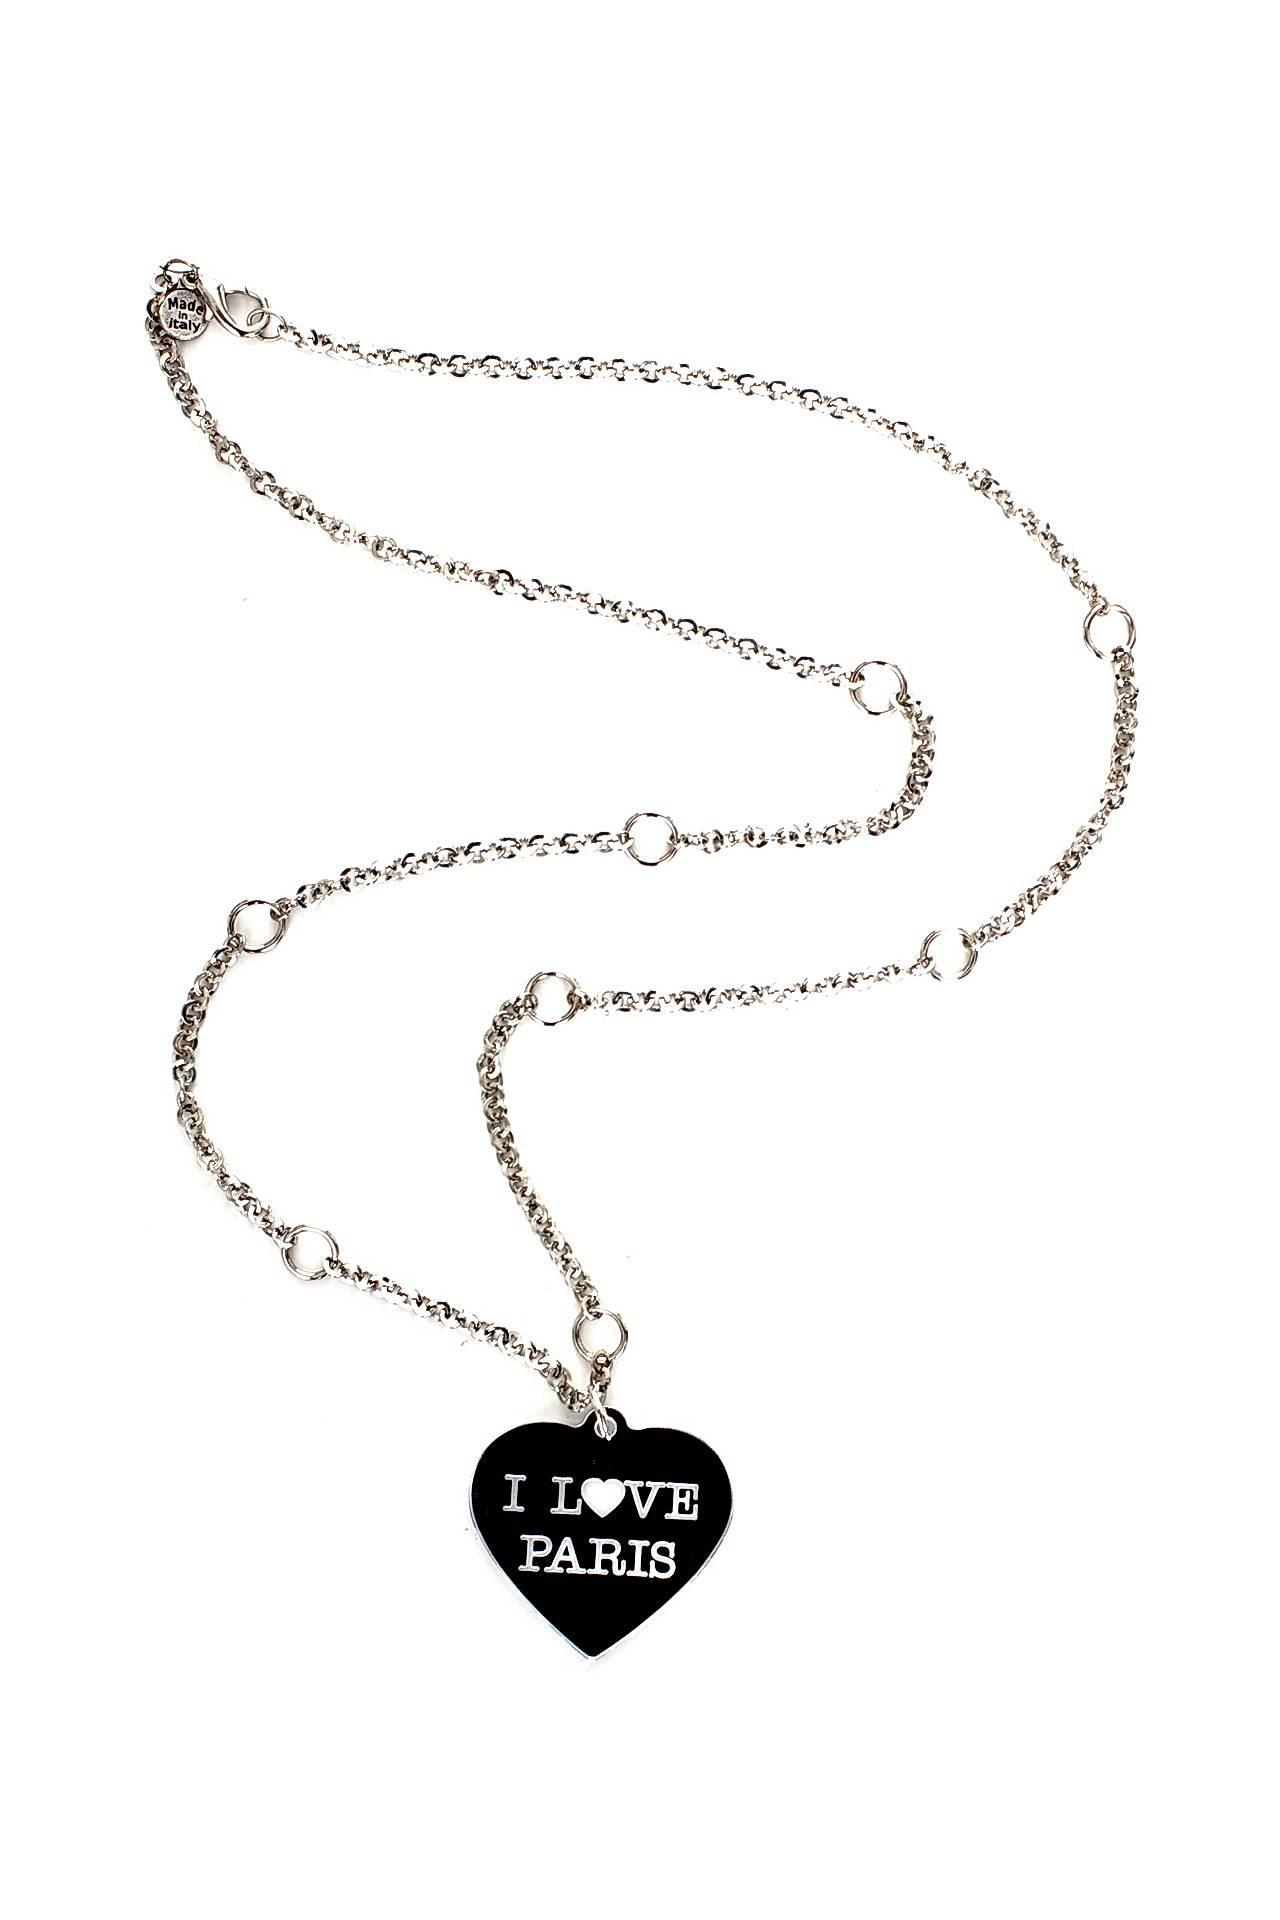 Цепь/цепочка бижутерная EUROBIJOUX 28488-Б/р серебряная цепочка